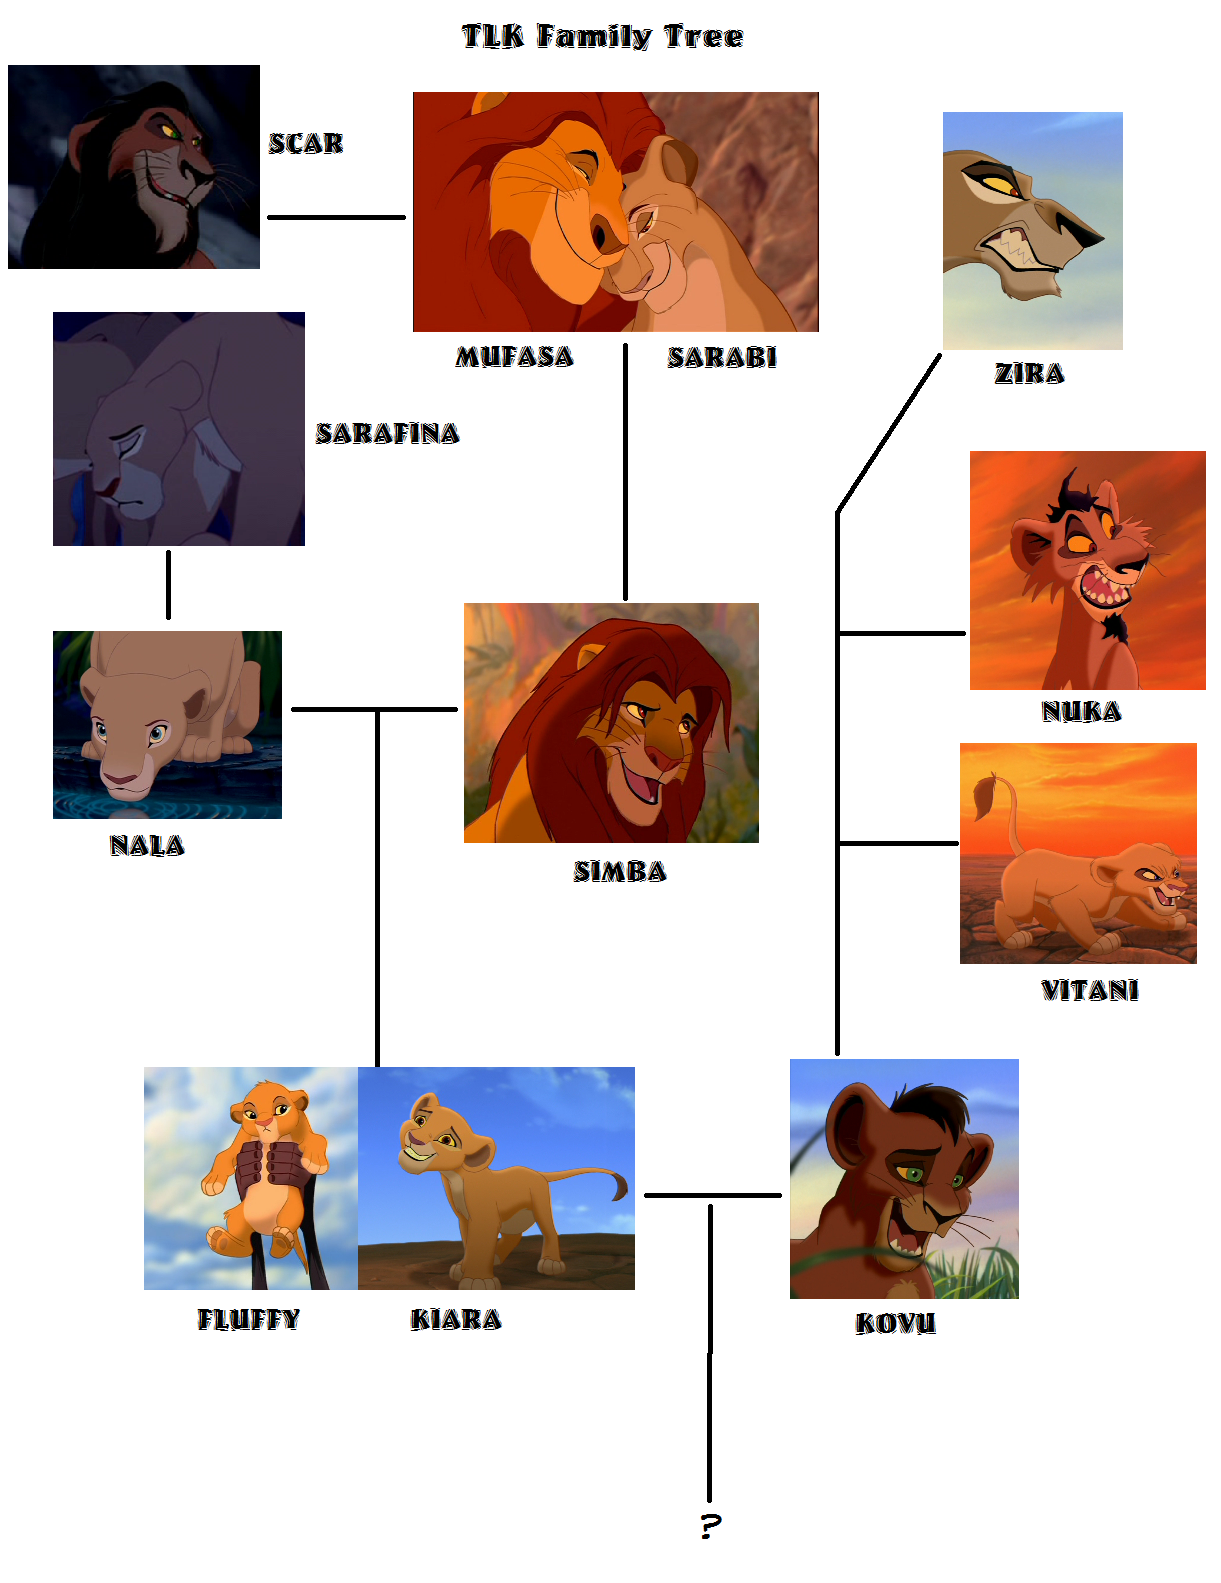 TLK Family arbre